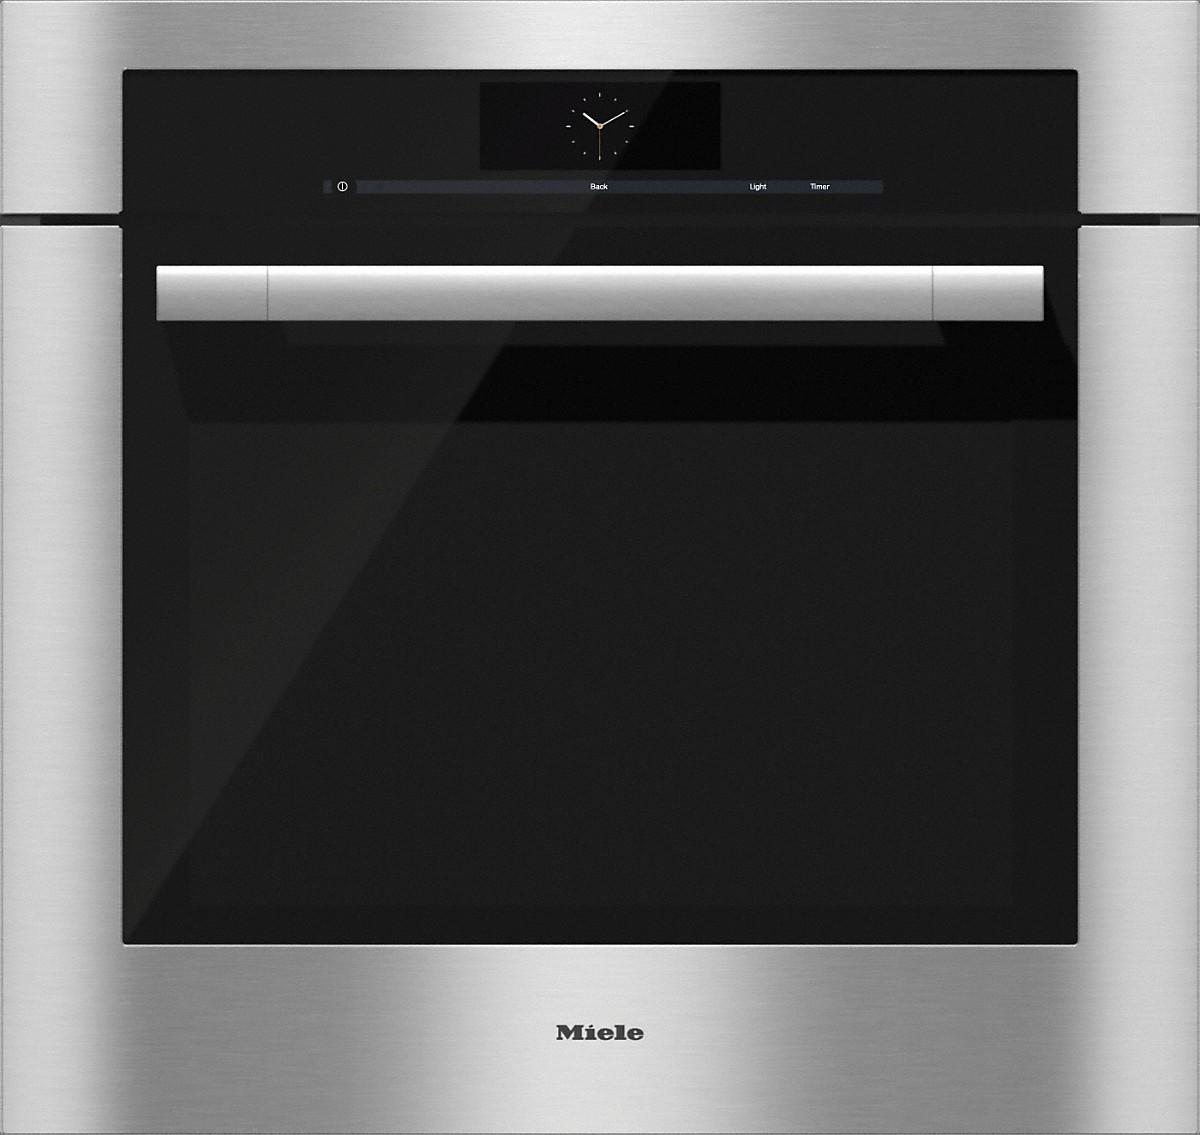 miele ovens h 6780 bp 30 inch oven. Black Bedroom Furniture Sets. Home Design Ideas